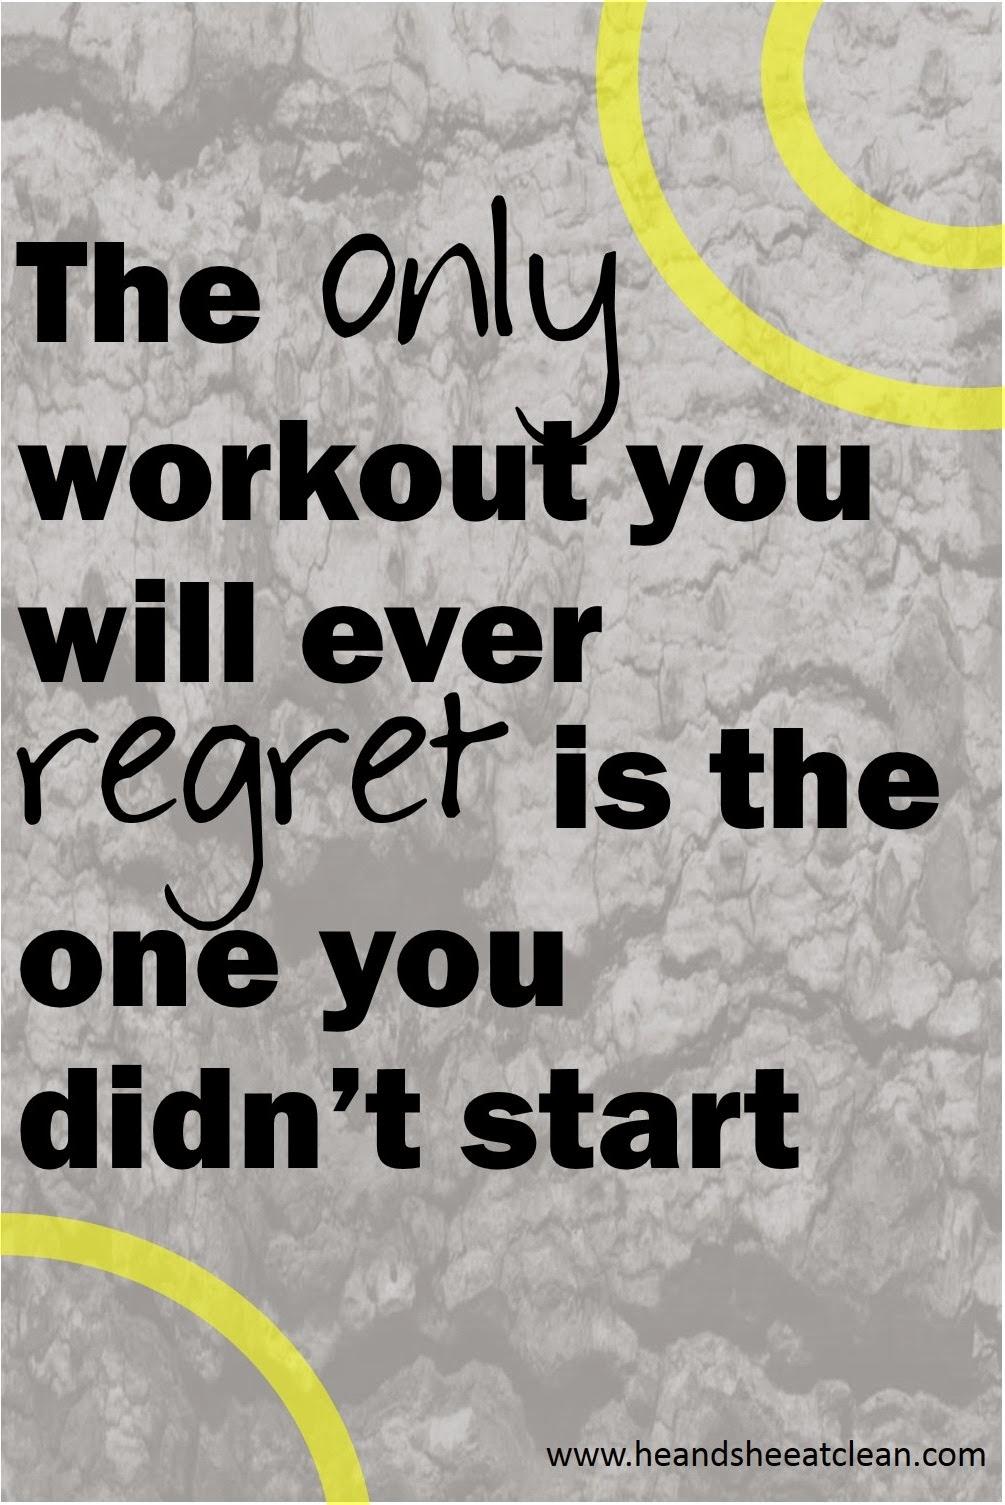 42+ Workout Motivation Wallpaper iPhone on WallpaperSafari